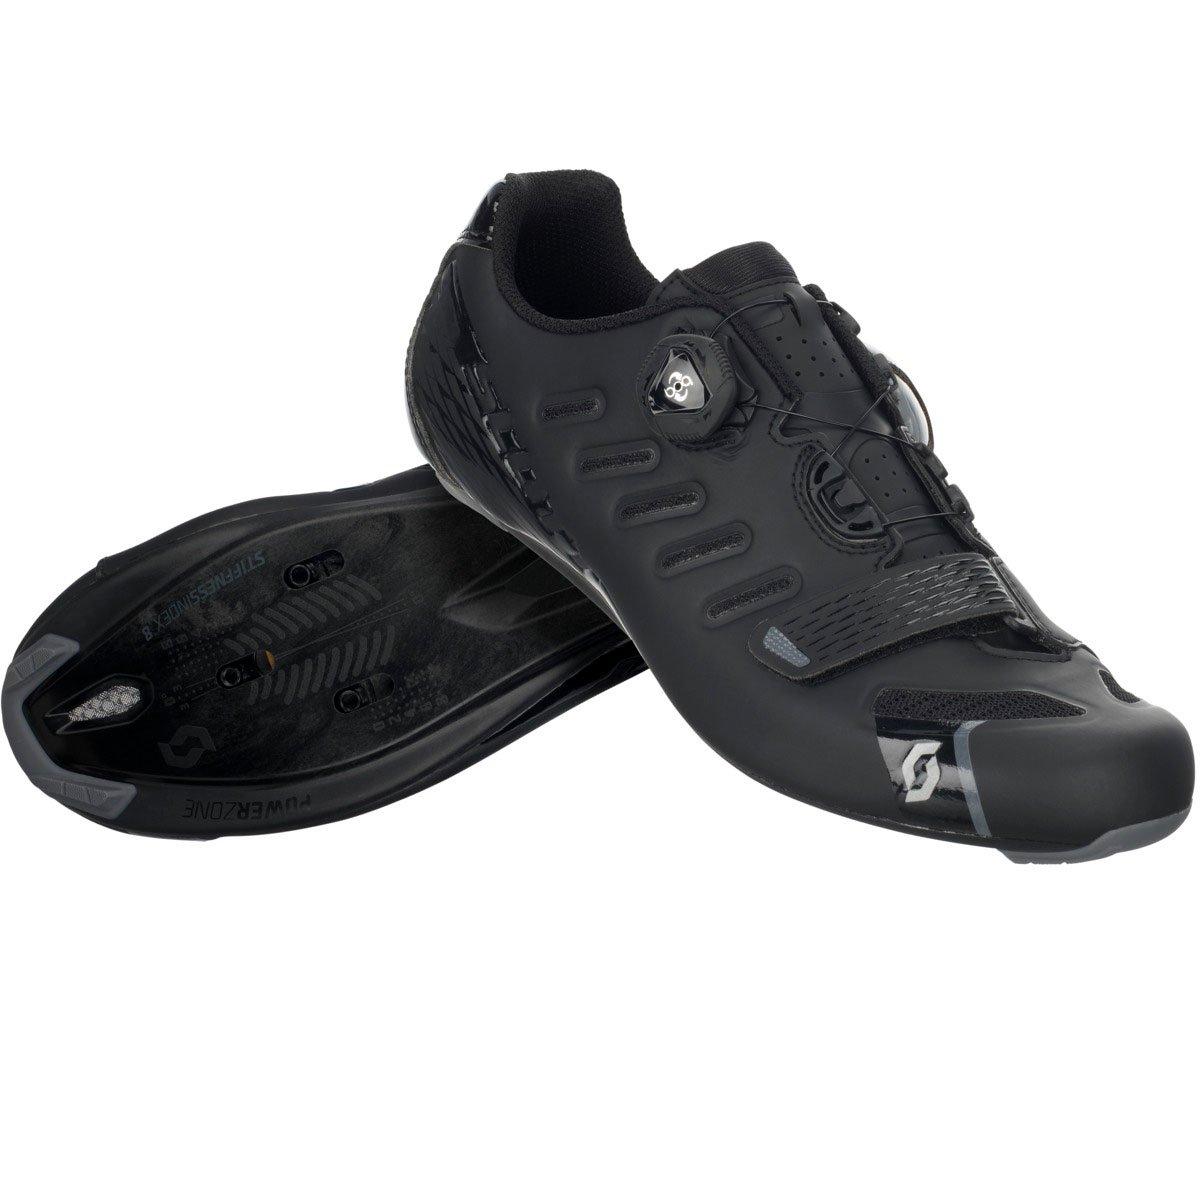 Scott Road Team BOA Shoe - Men's Matte Black/Gloss Black, 41.0 B01LXL1C6G Parent